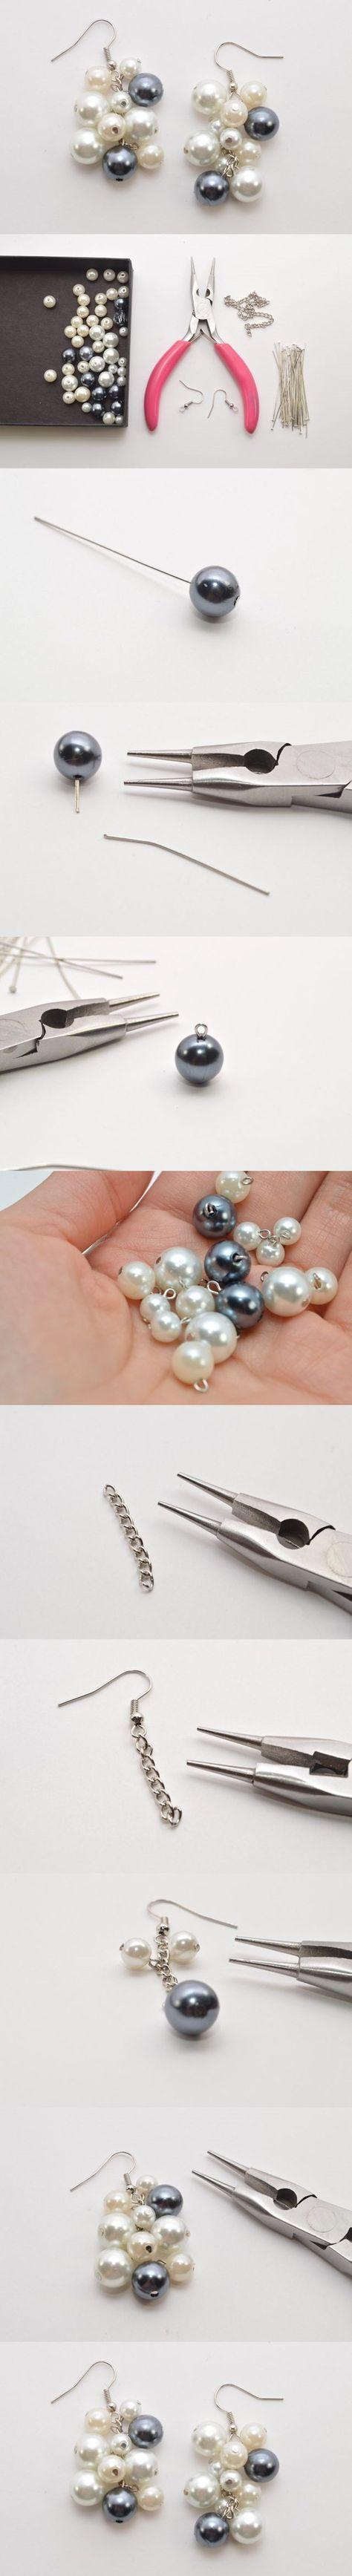 Easy Tutorial on Pretty Pearl Cluster Earrings Making